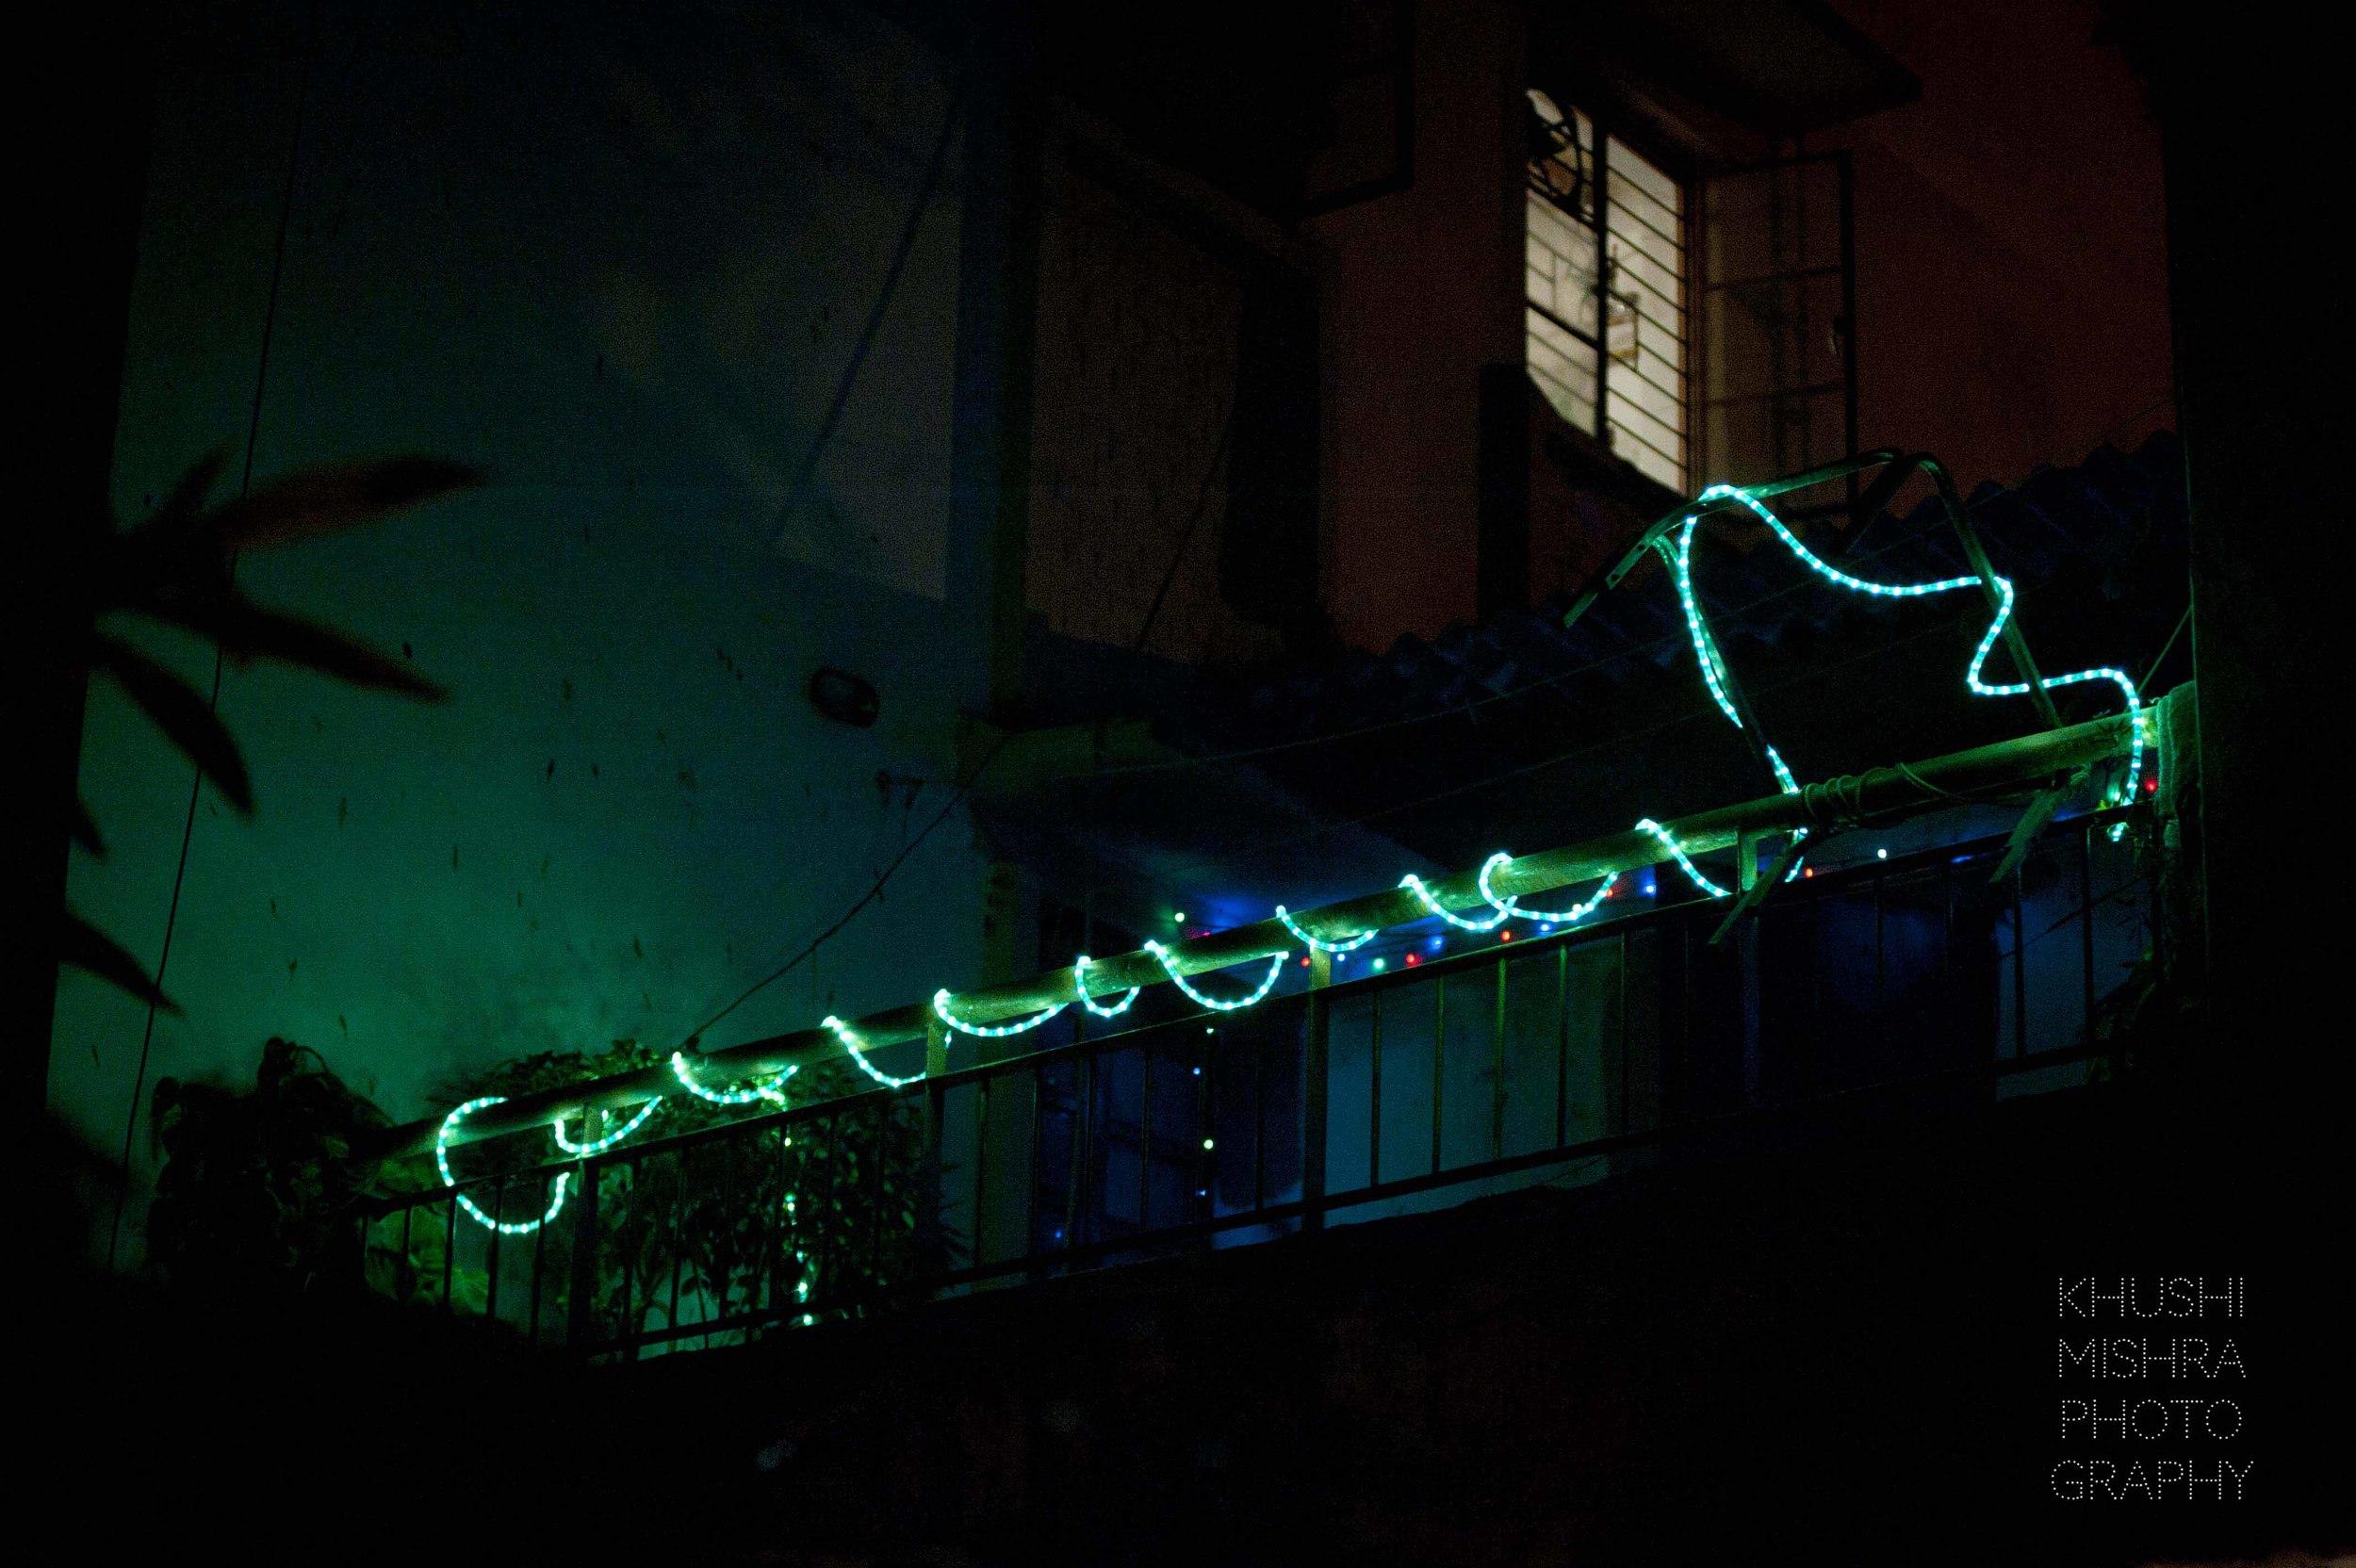 neighbour diwali_diwali_dsc_5257.jpg